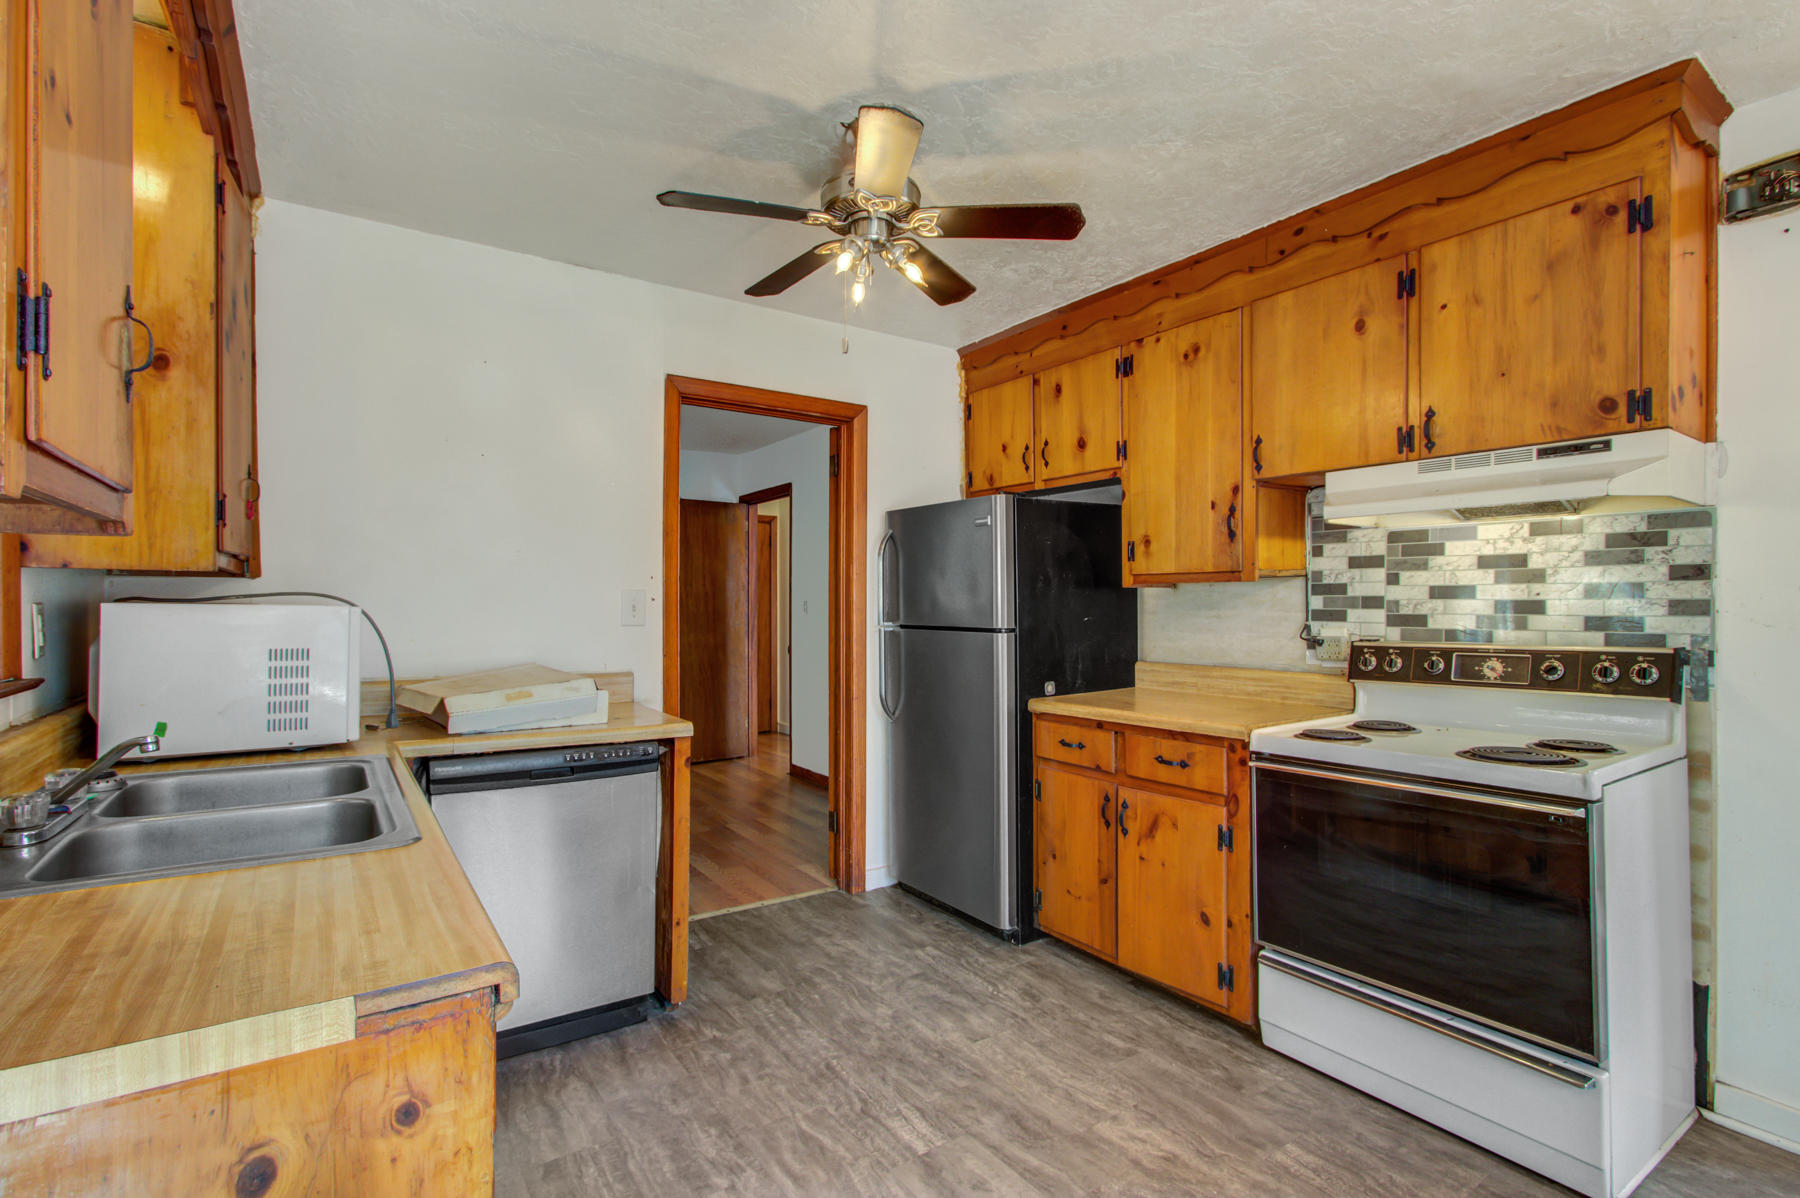 Port Park Homes For Sale - 5814 Moore, Hanahan, SC - 23